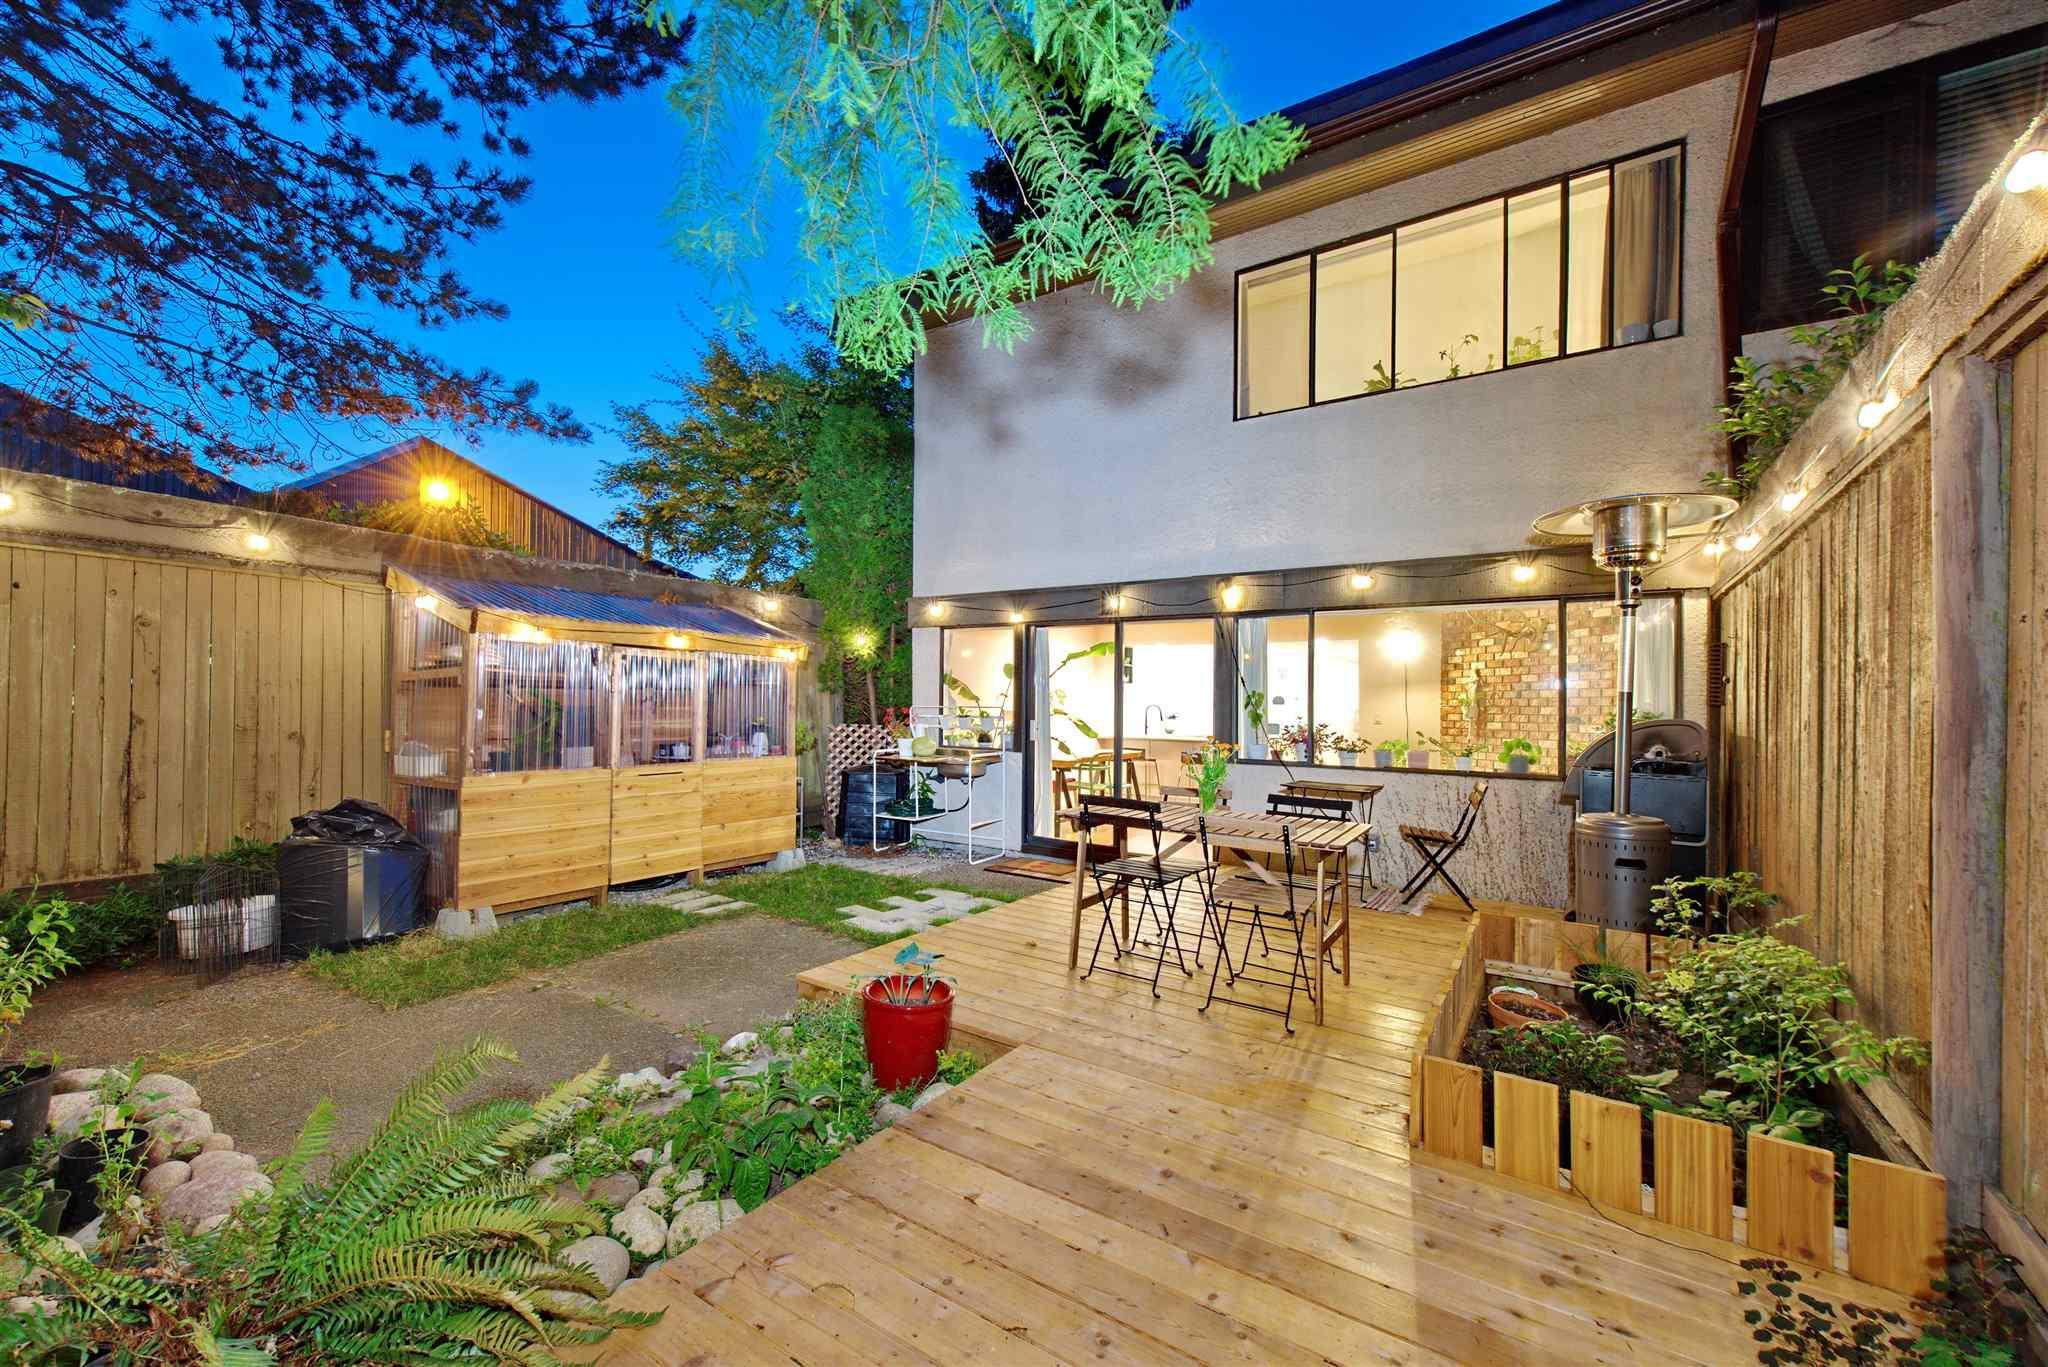 37 11391 7TH AVENUE - Steveston Village Townhouse for sale, 3 Bedrooms (R2604942)